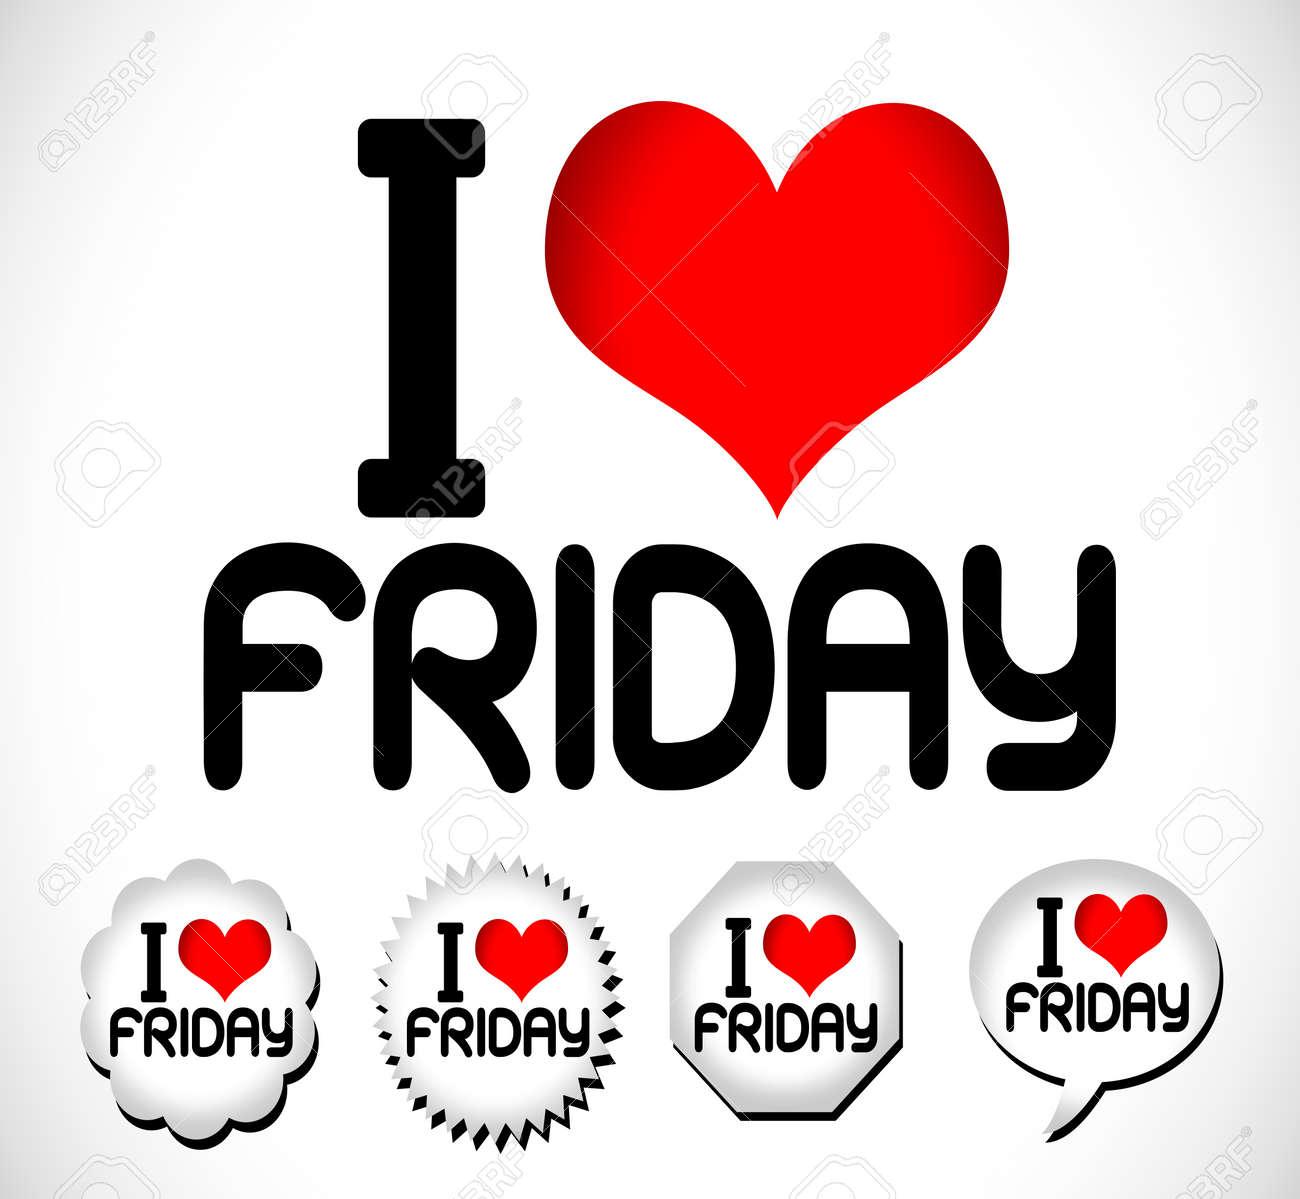 I Love The Days of the Week Sunday , Monday , Tuesday , Wednesday , Thursday , Friday , Saturday , Stock Vector - 24290418